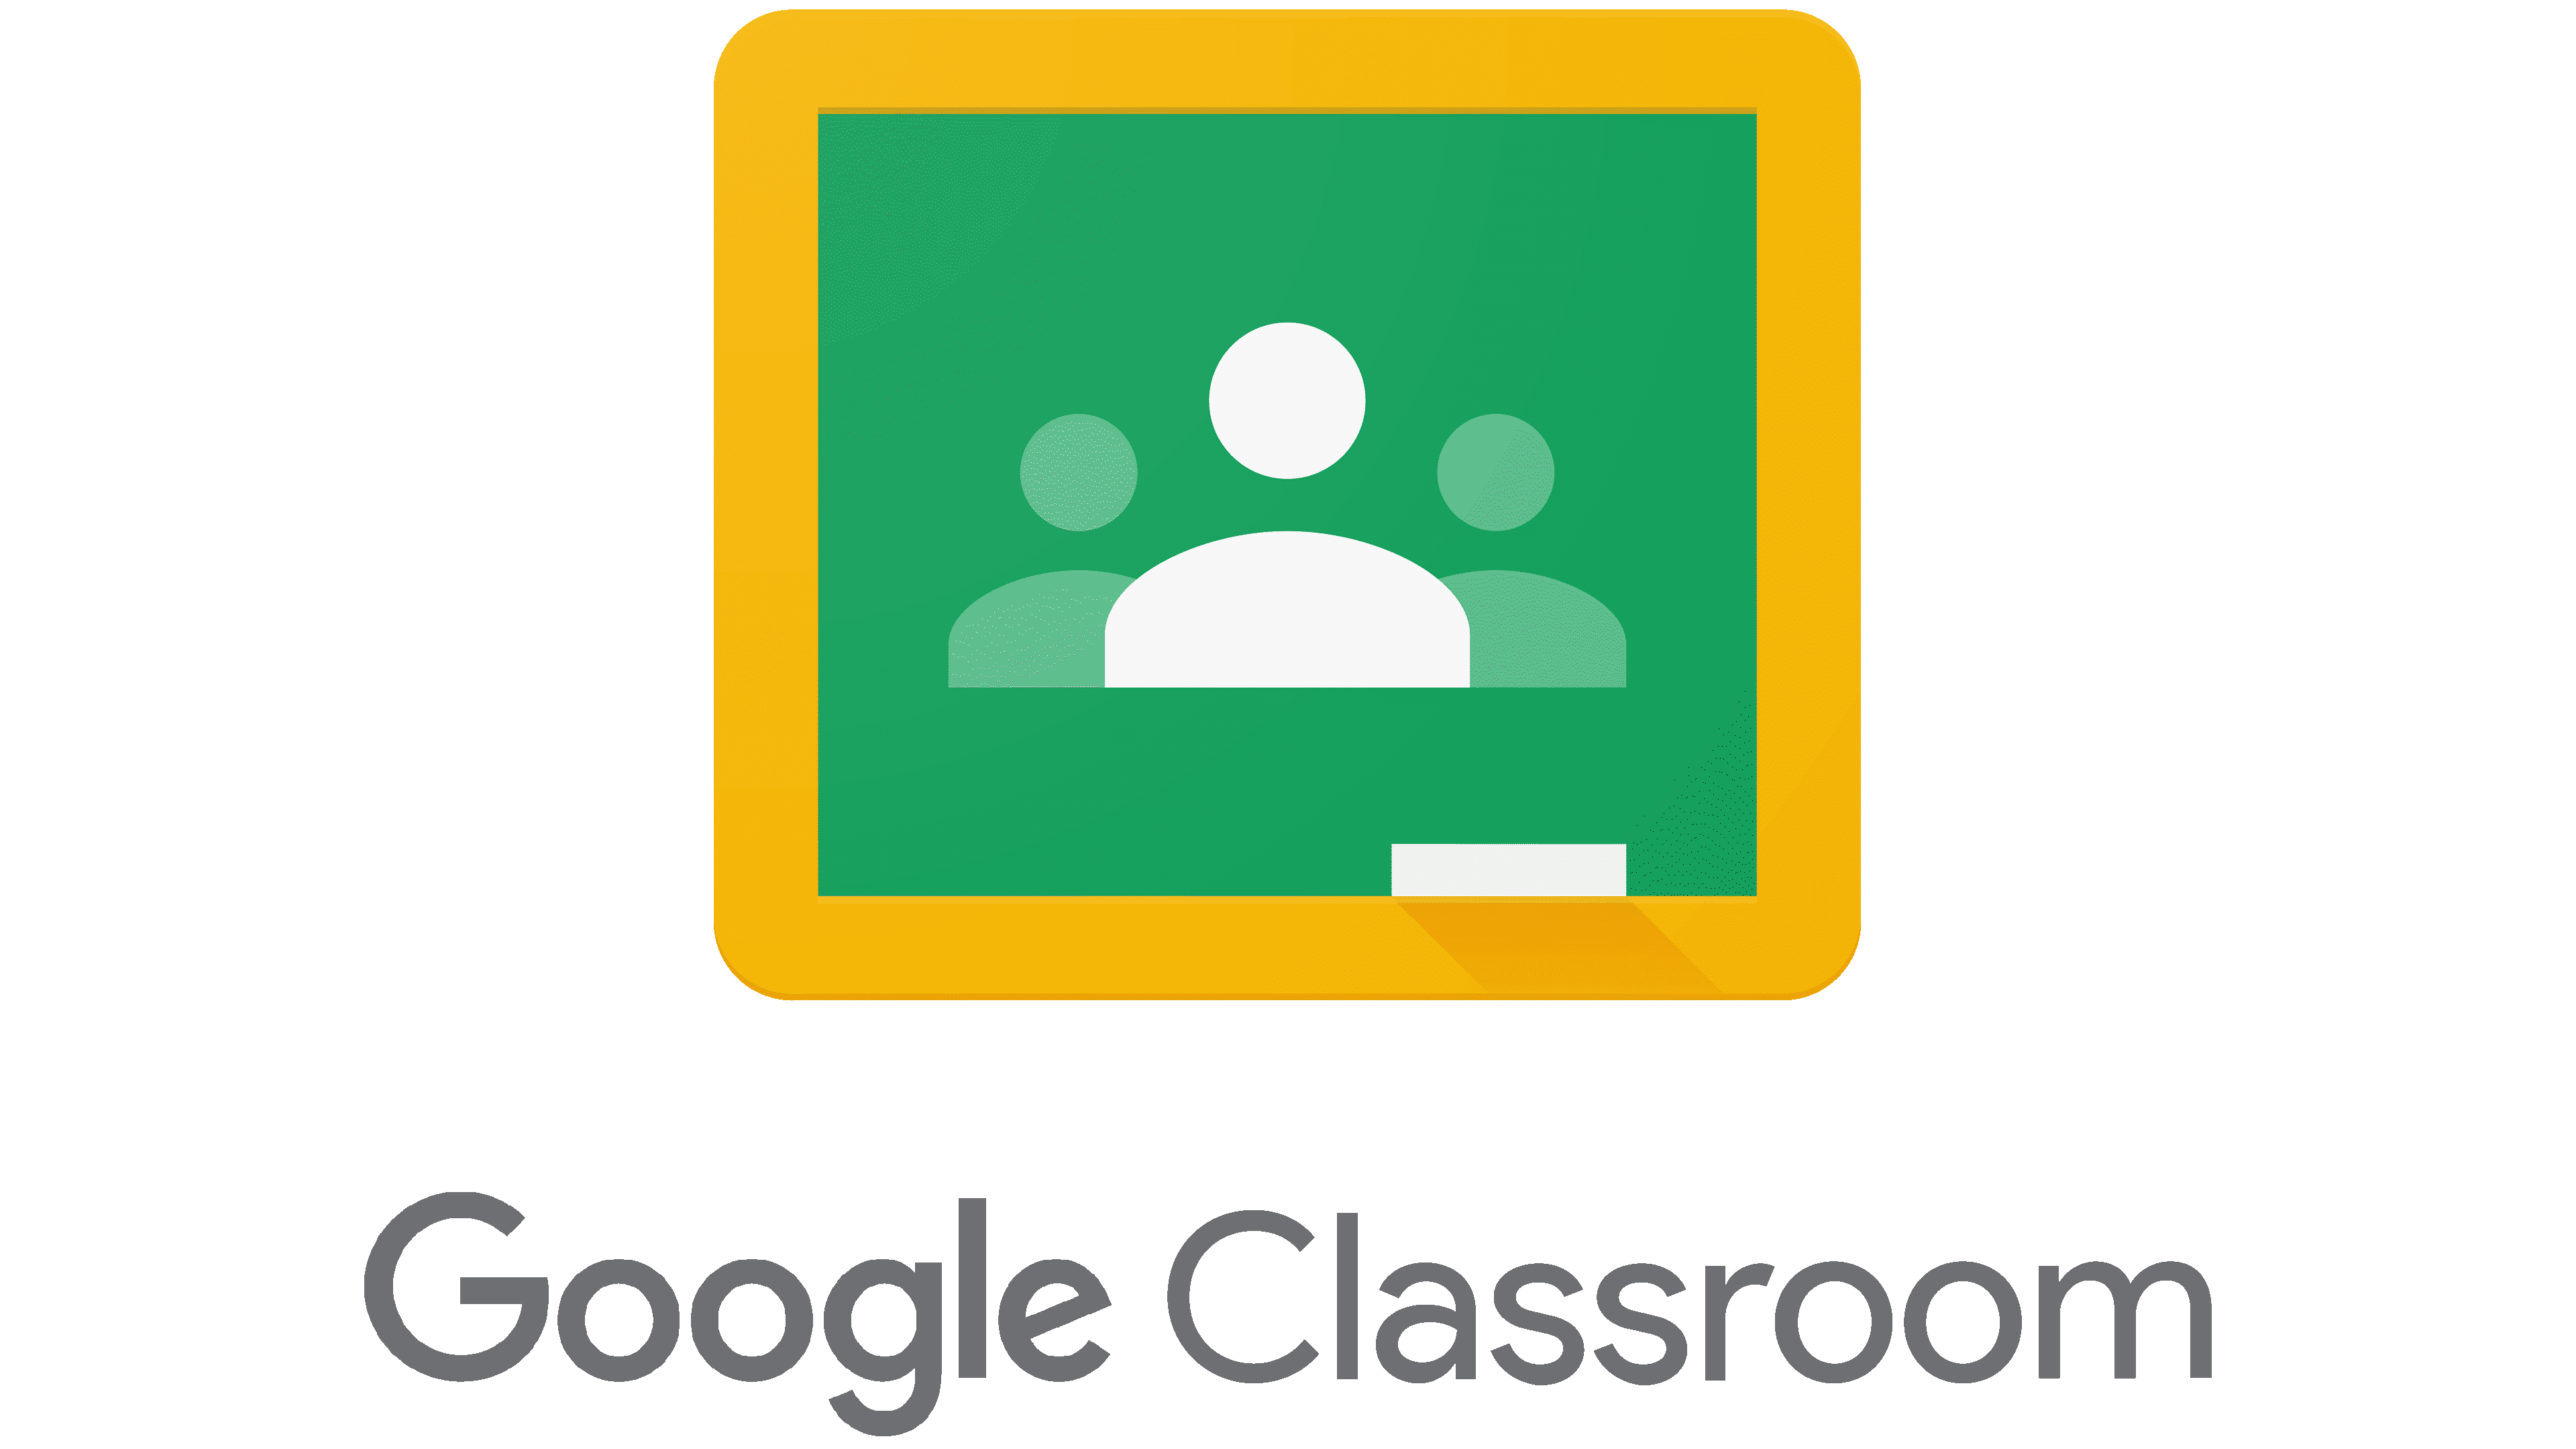 logo of Google Classroom